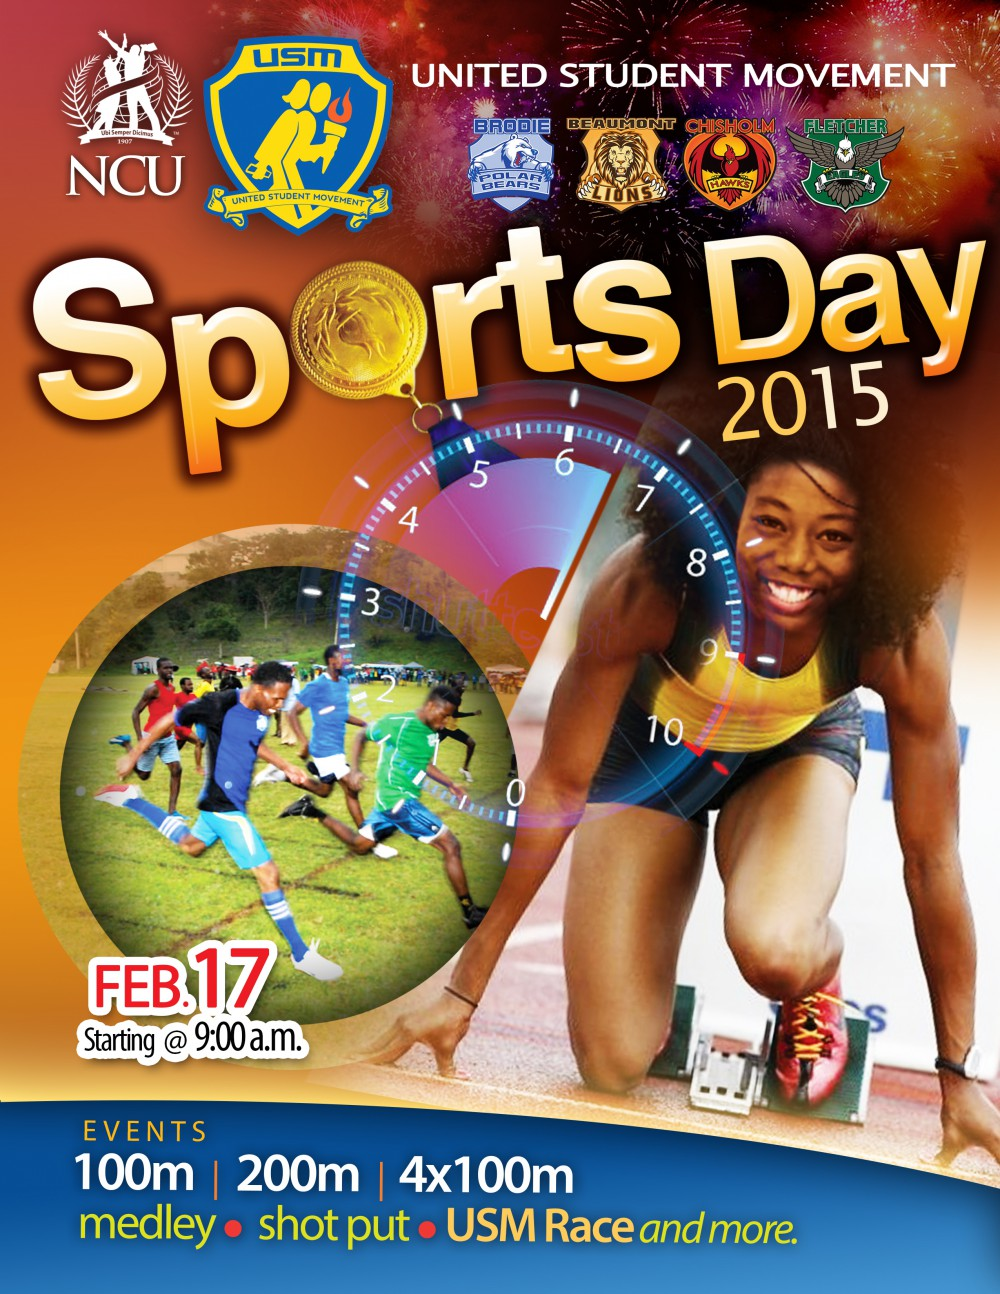 USM Sports Day 2015